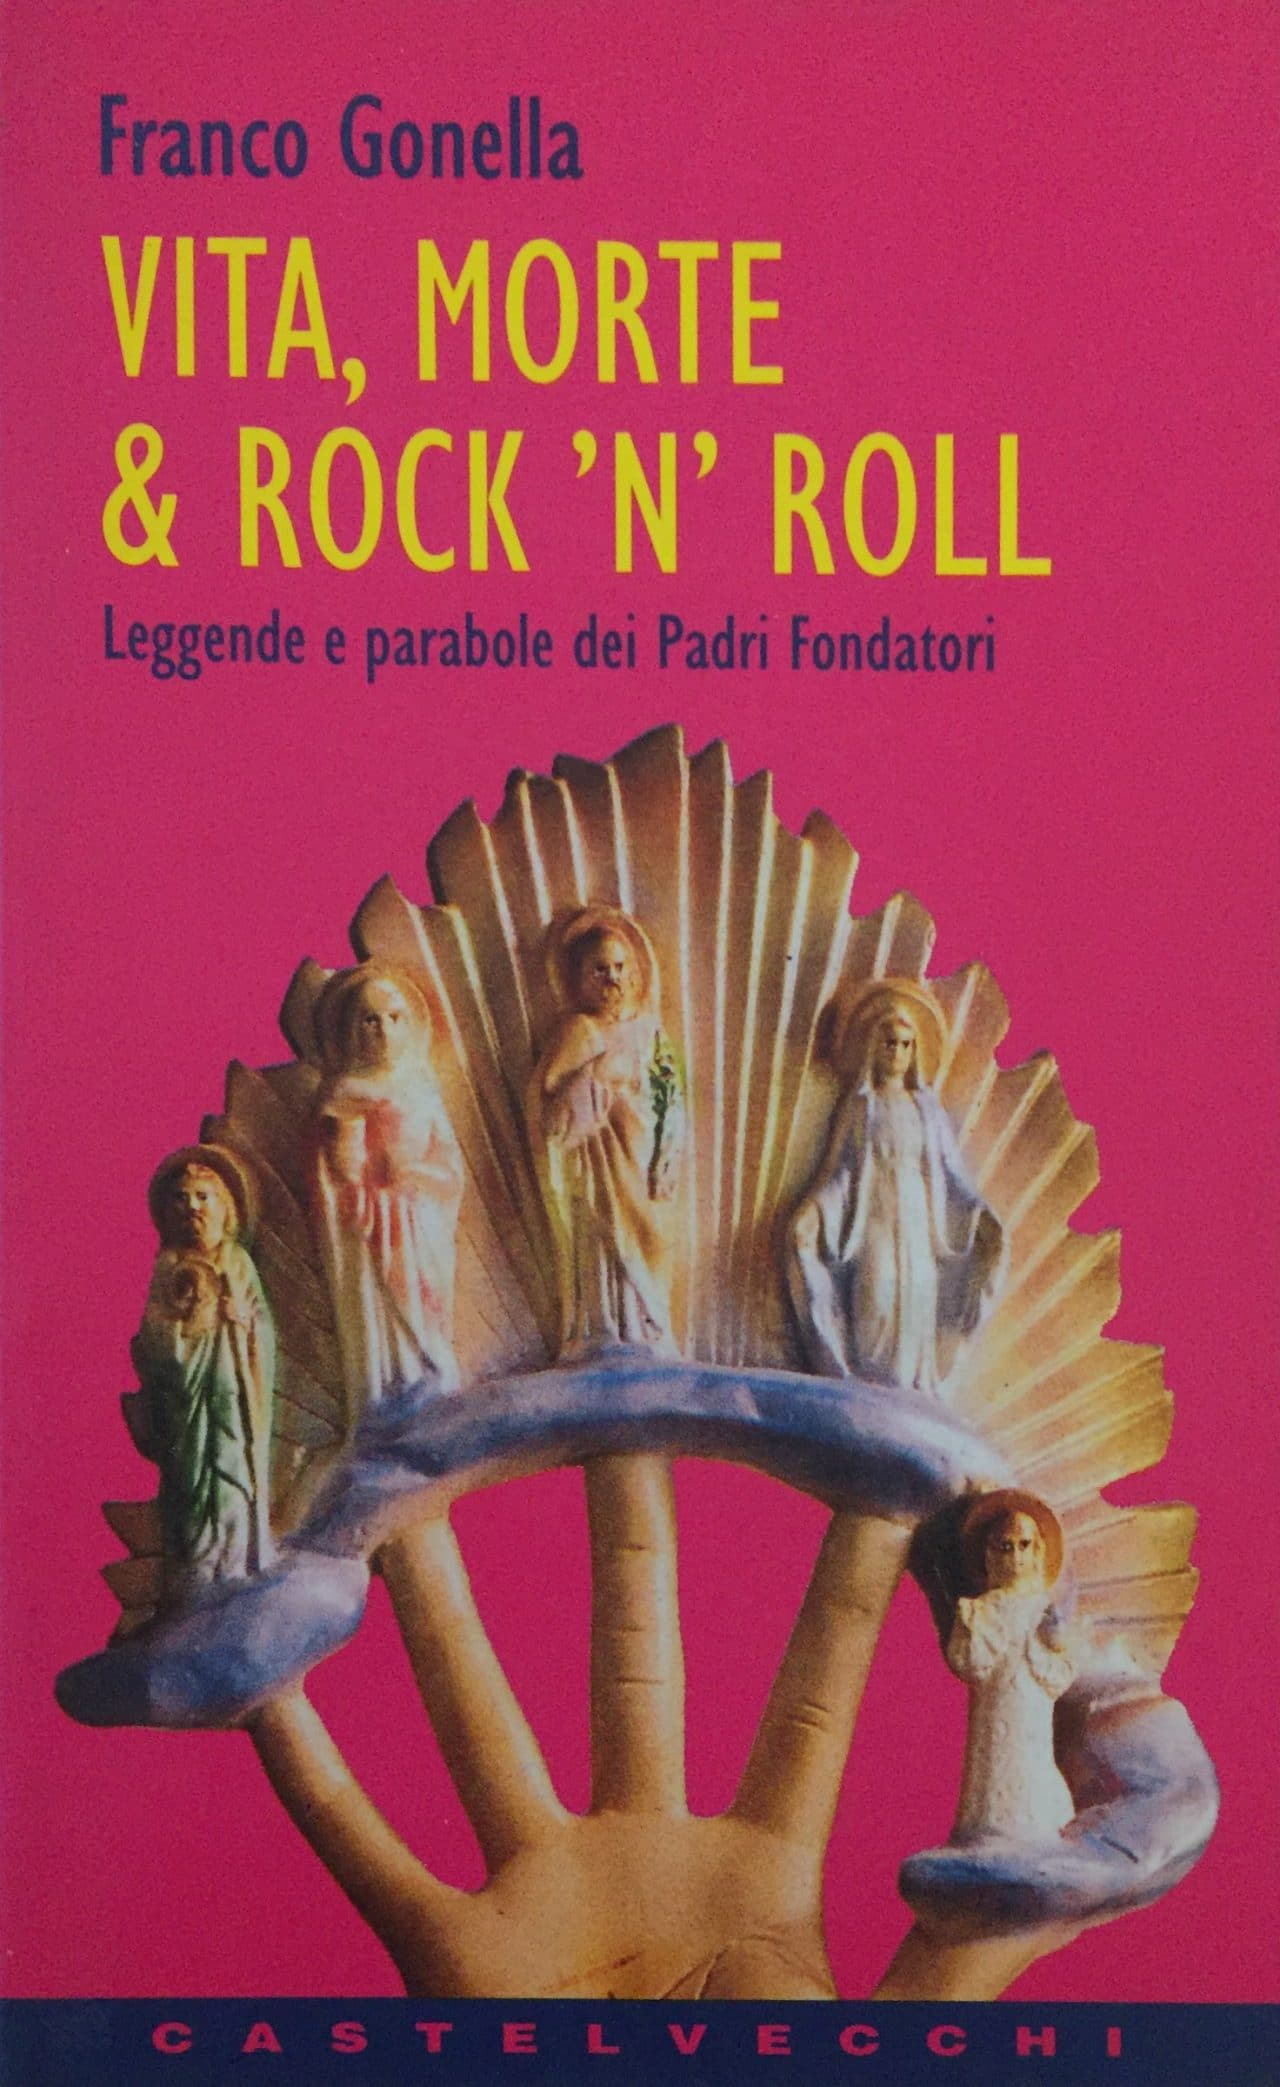 Vita, Morte & Rock 'n' Roll